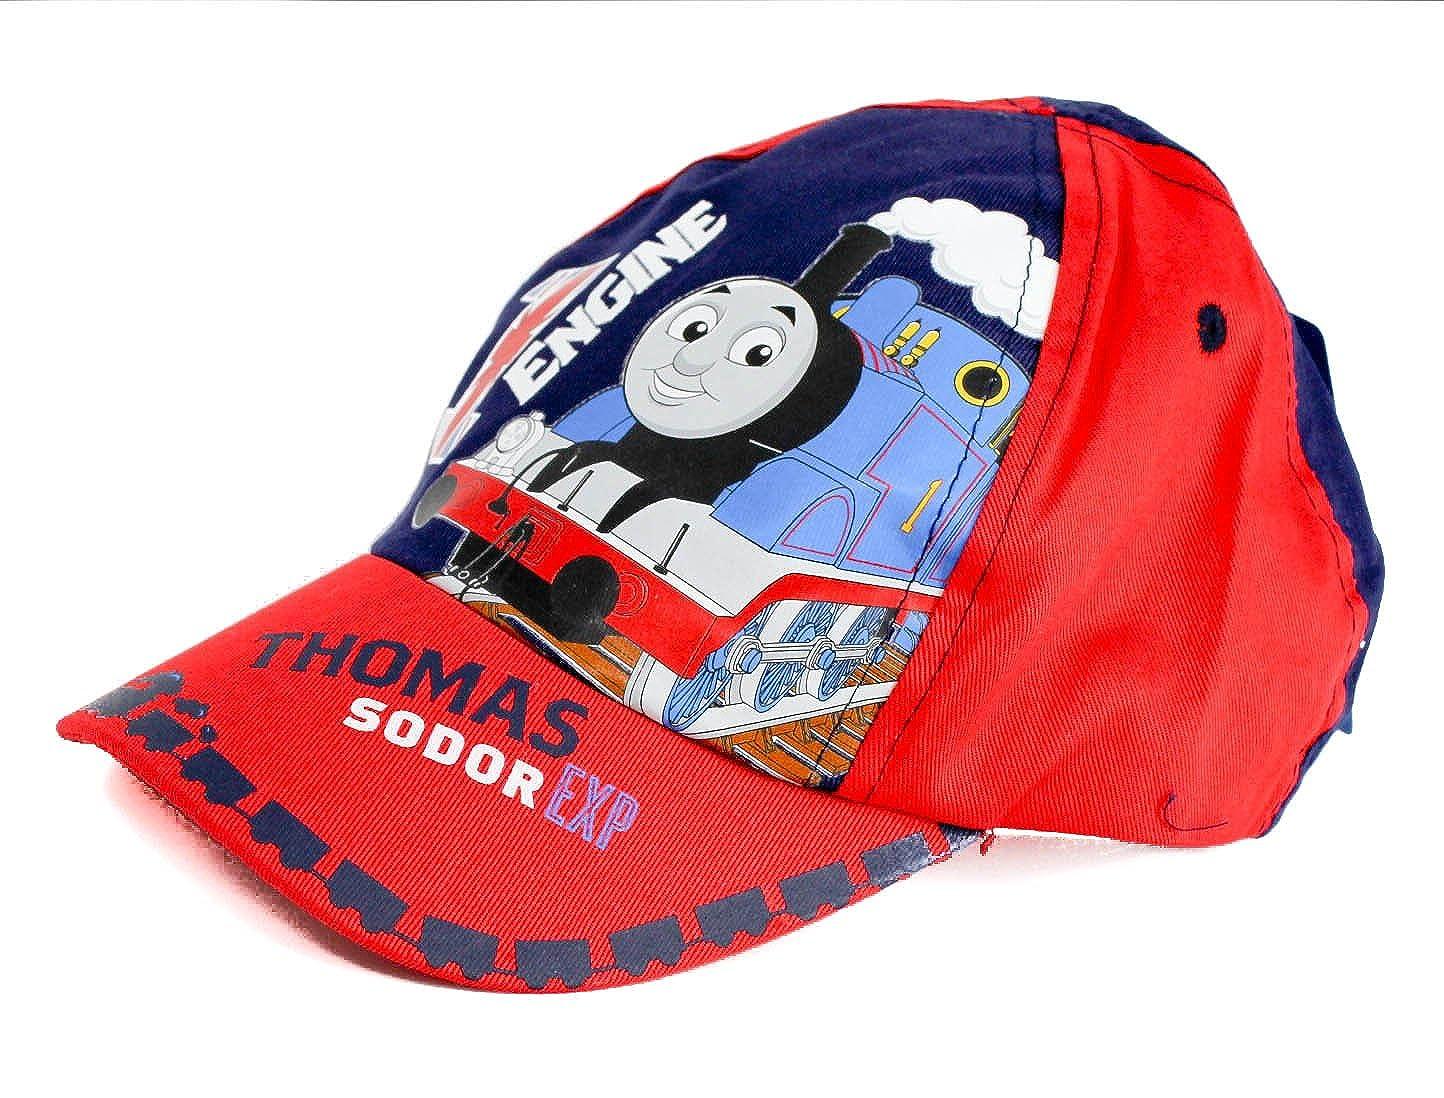 Boys Thomas The Tank Red Sodor Express Sun Cap   Sun Hat 1-4 Years   Amazon.co.uk  Clothing 8464c441850